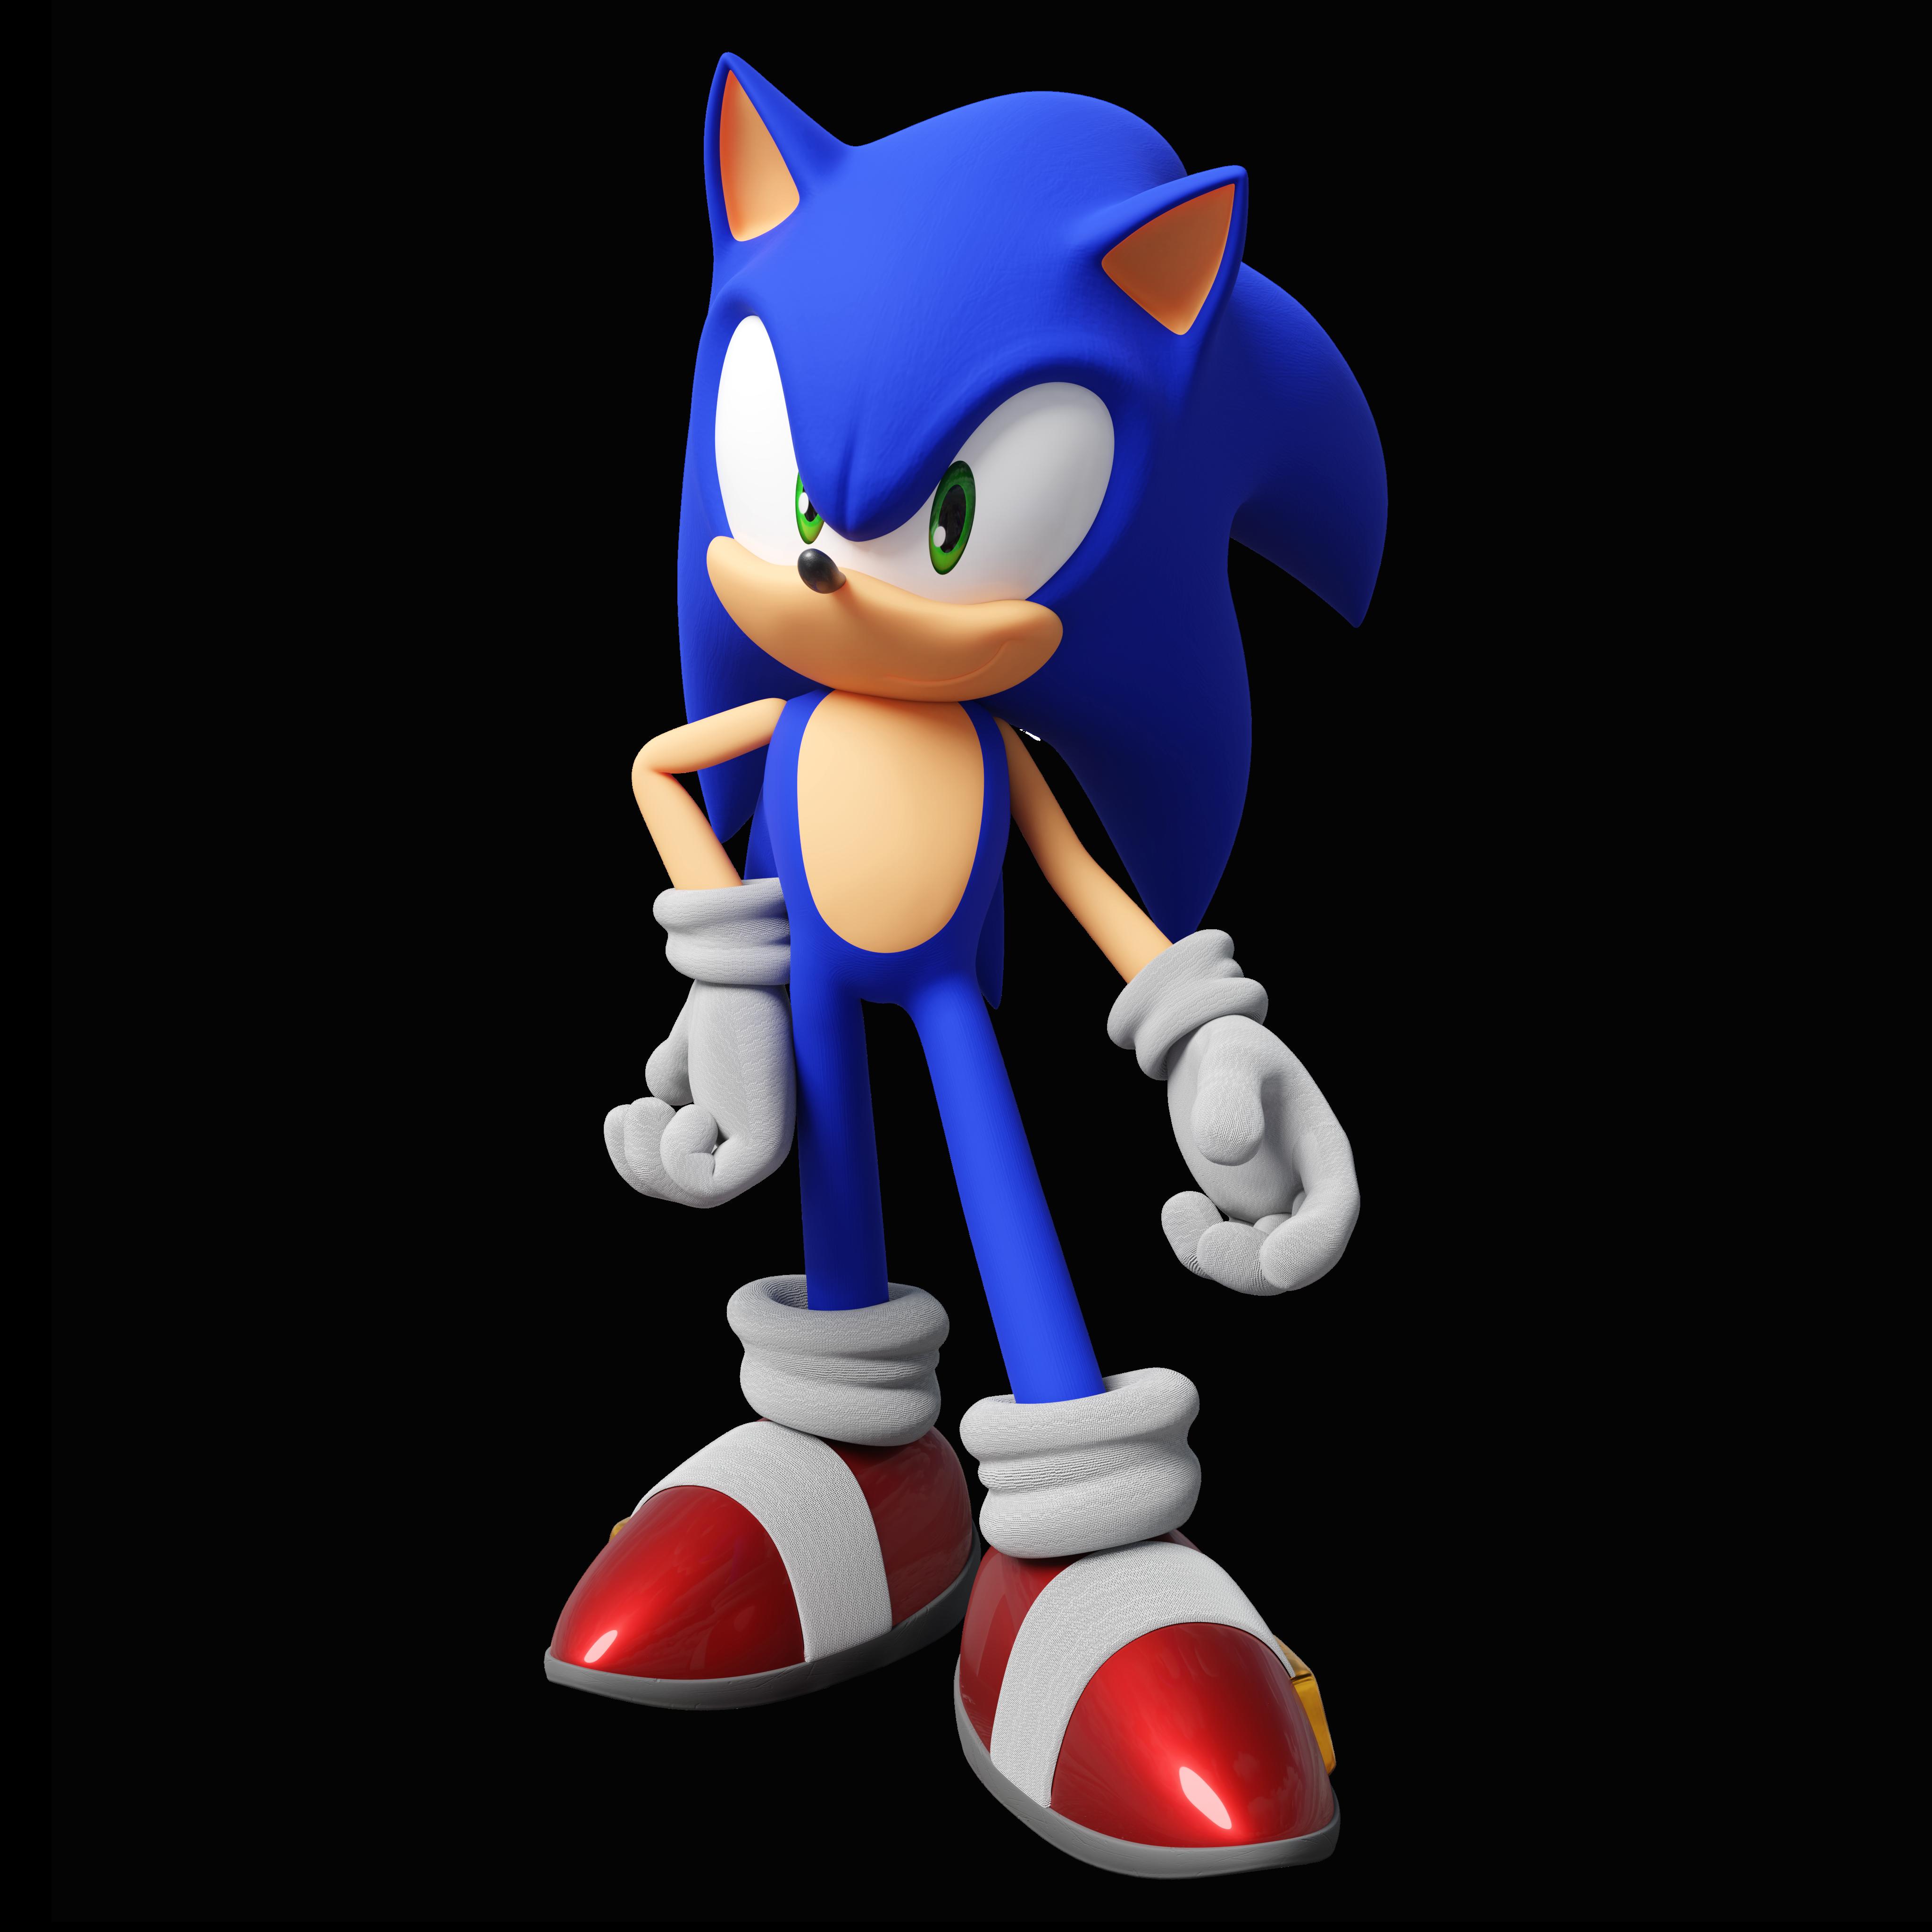 Sonic Unleashed Teaser Pose By Thatgiygasdoe On Deviantart